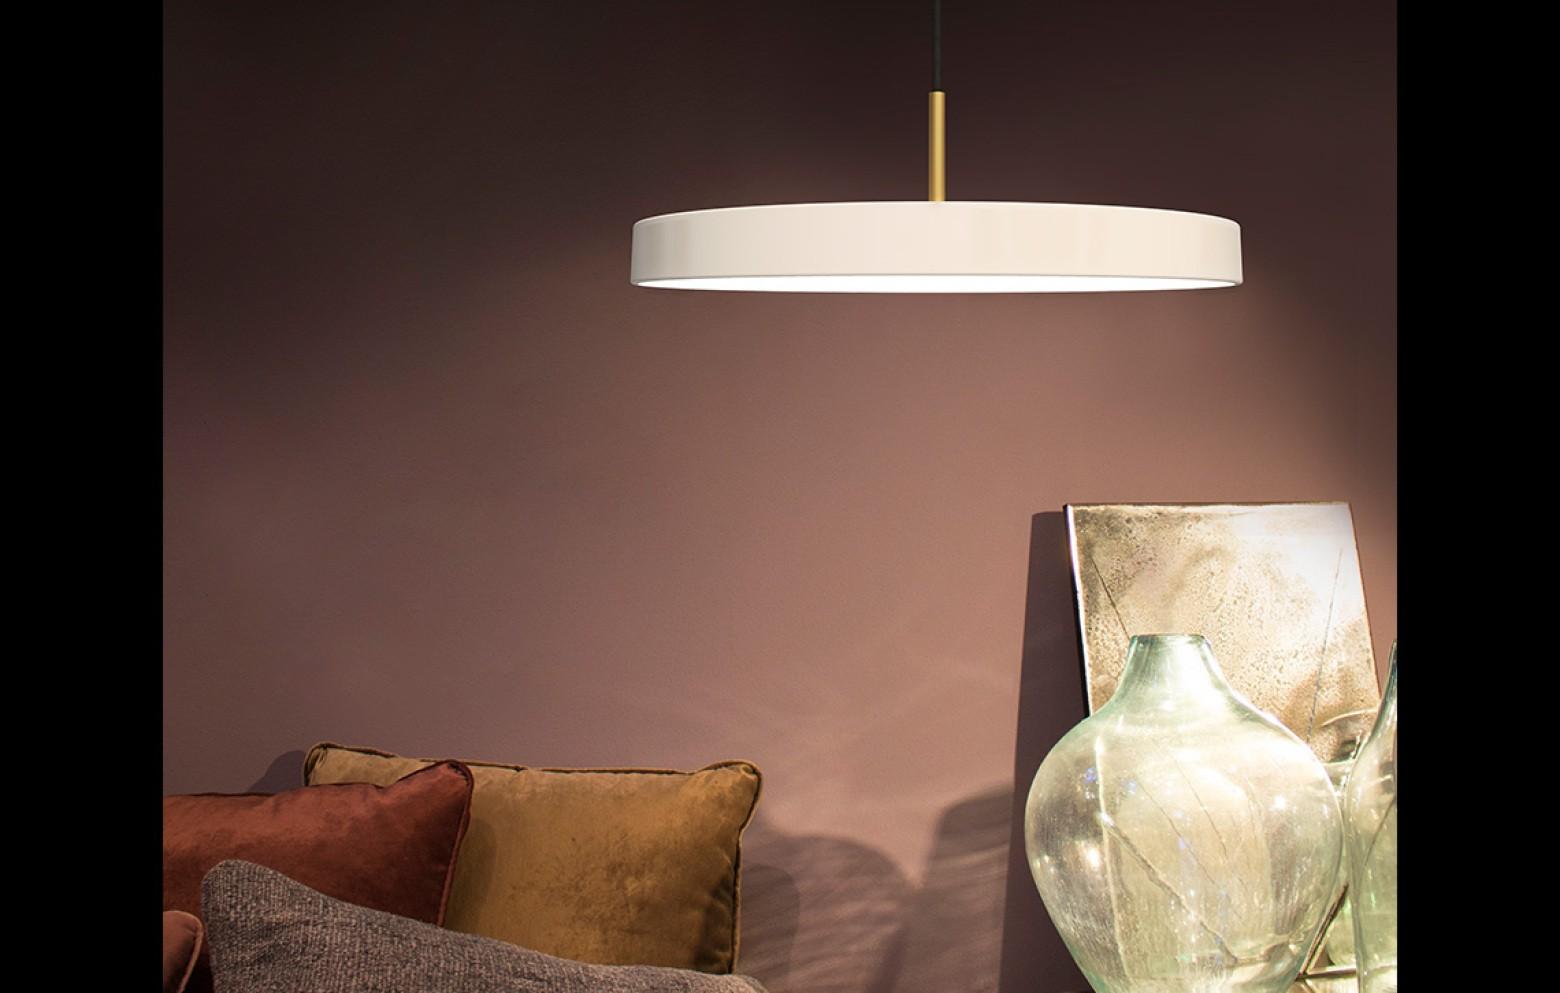 asteria lampen kleinm bel accessoires who 39 s perfect. Black Bedroom Furniture Sets. Home Design Ideas